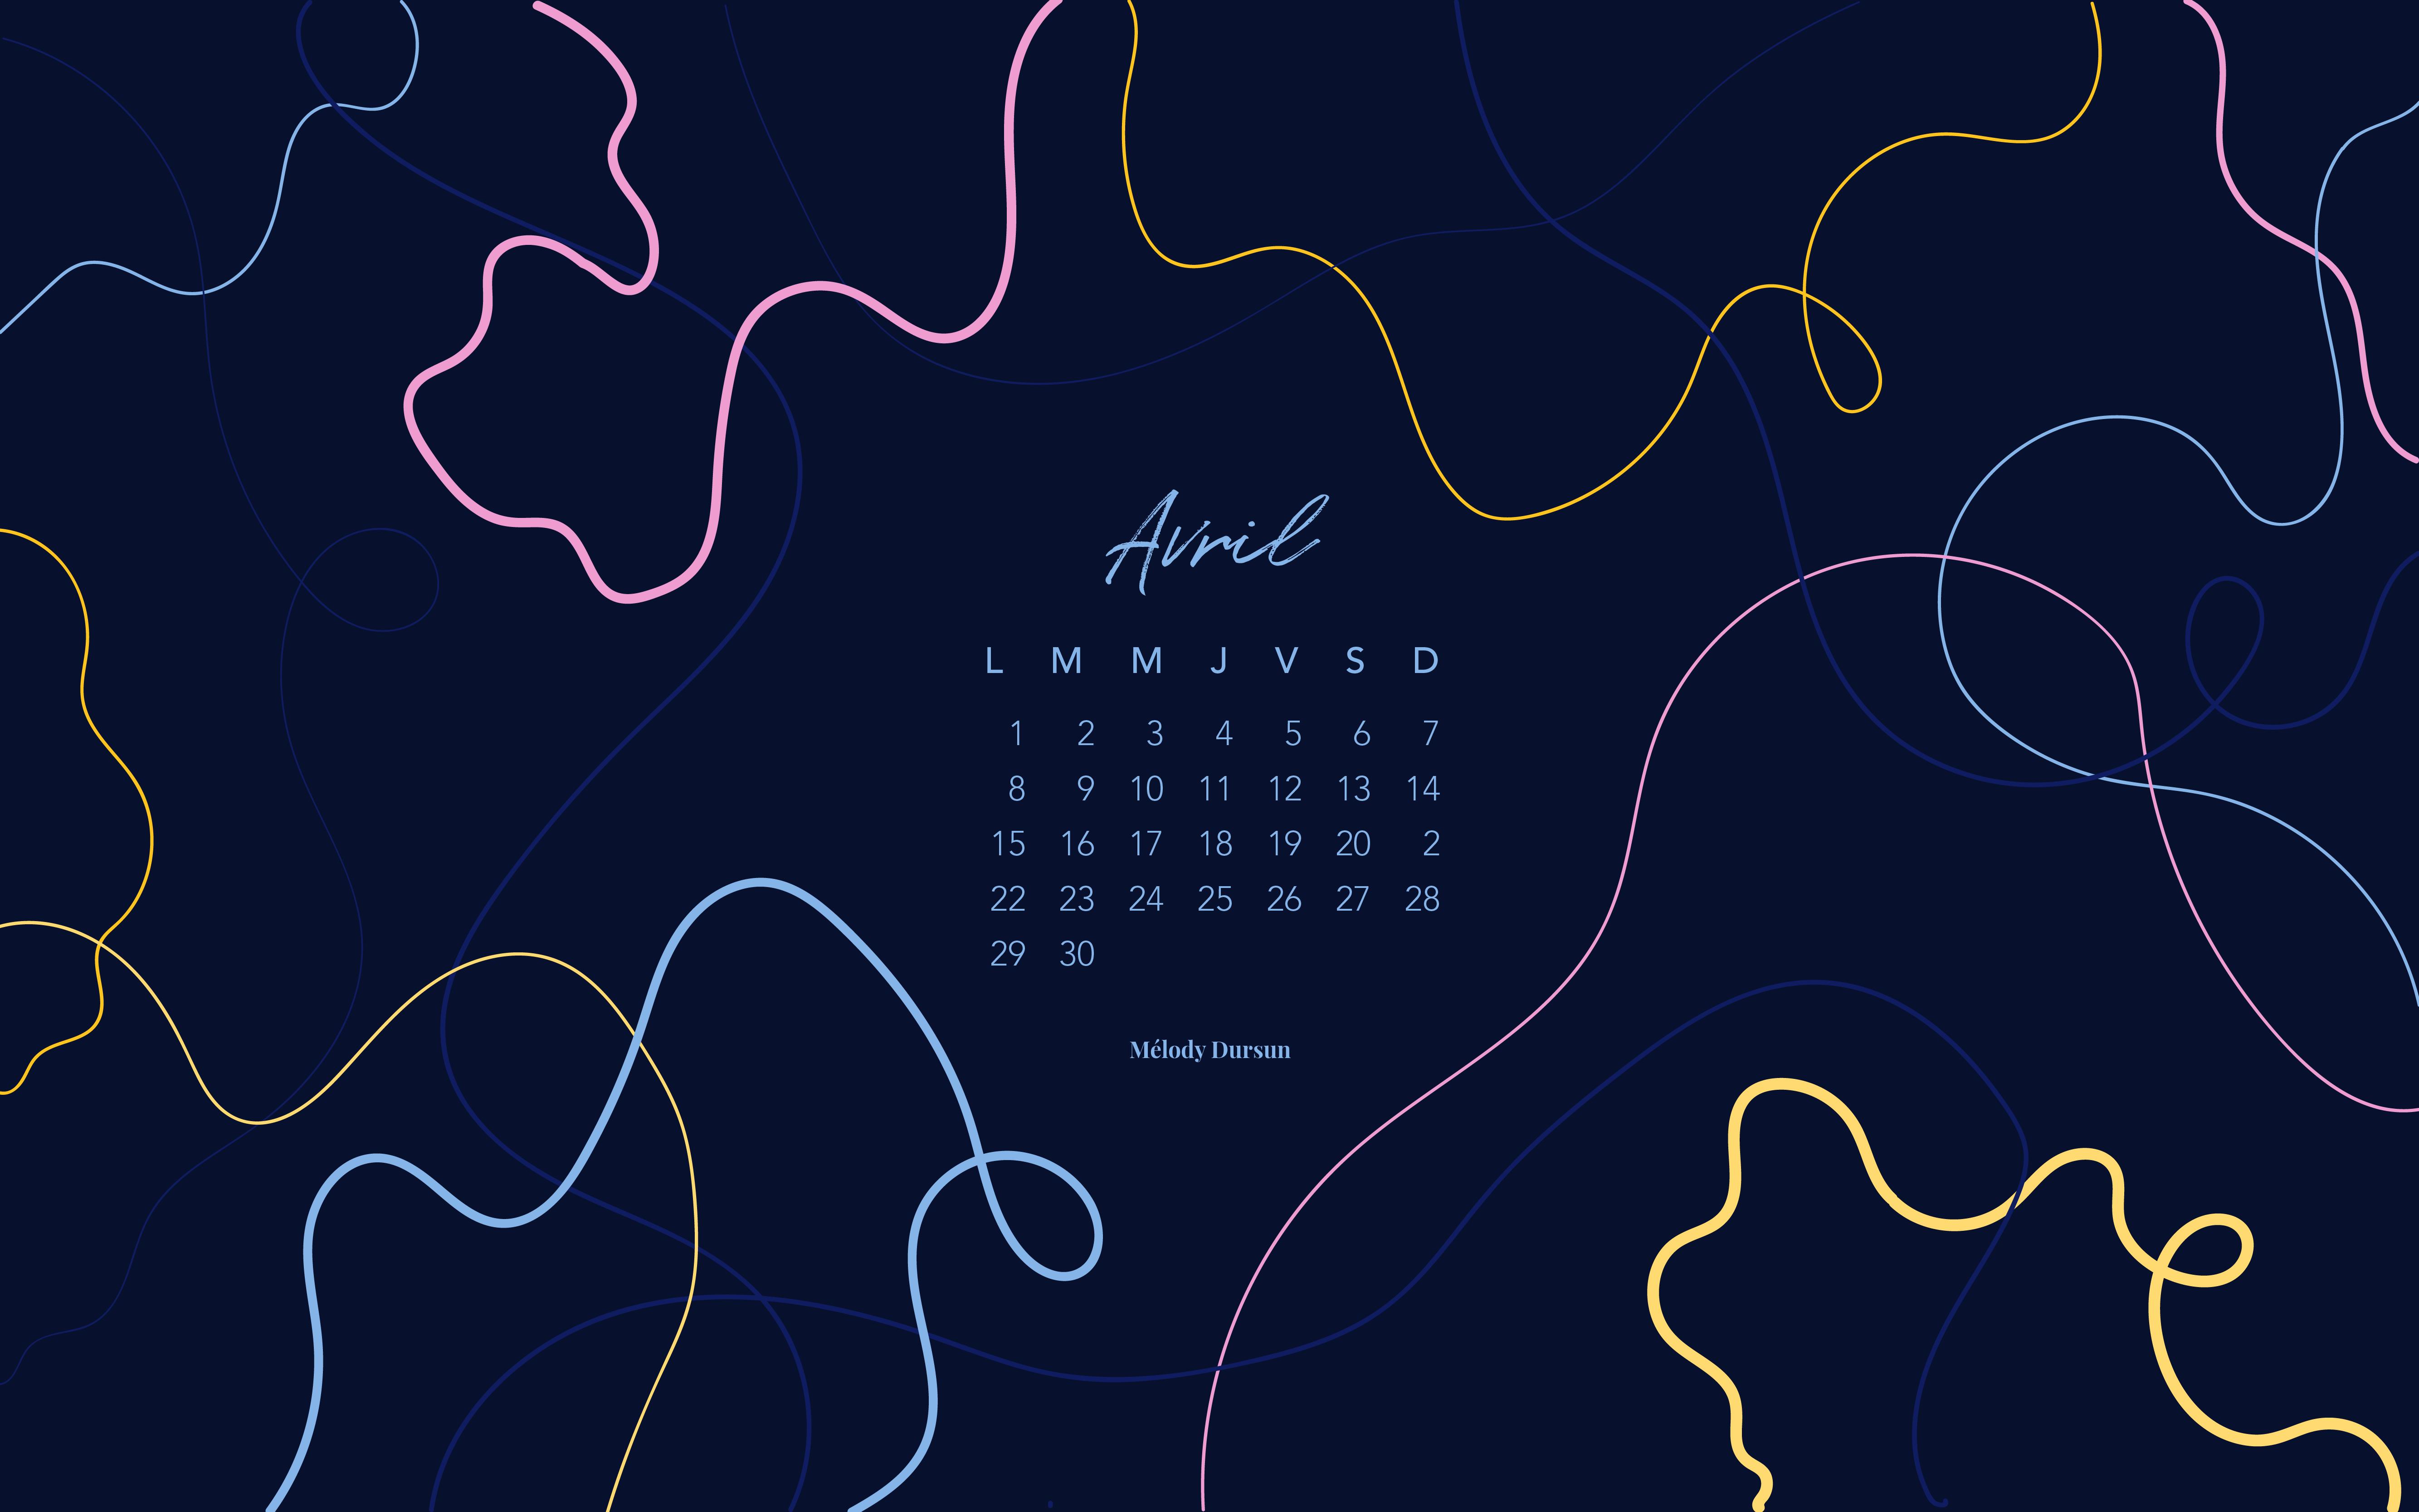 melodydursun-calendrier-avril2019